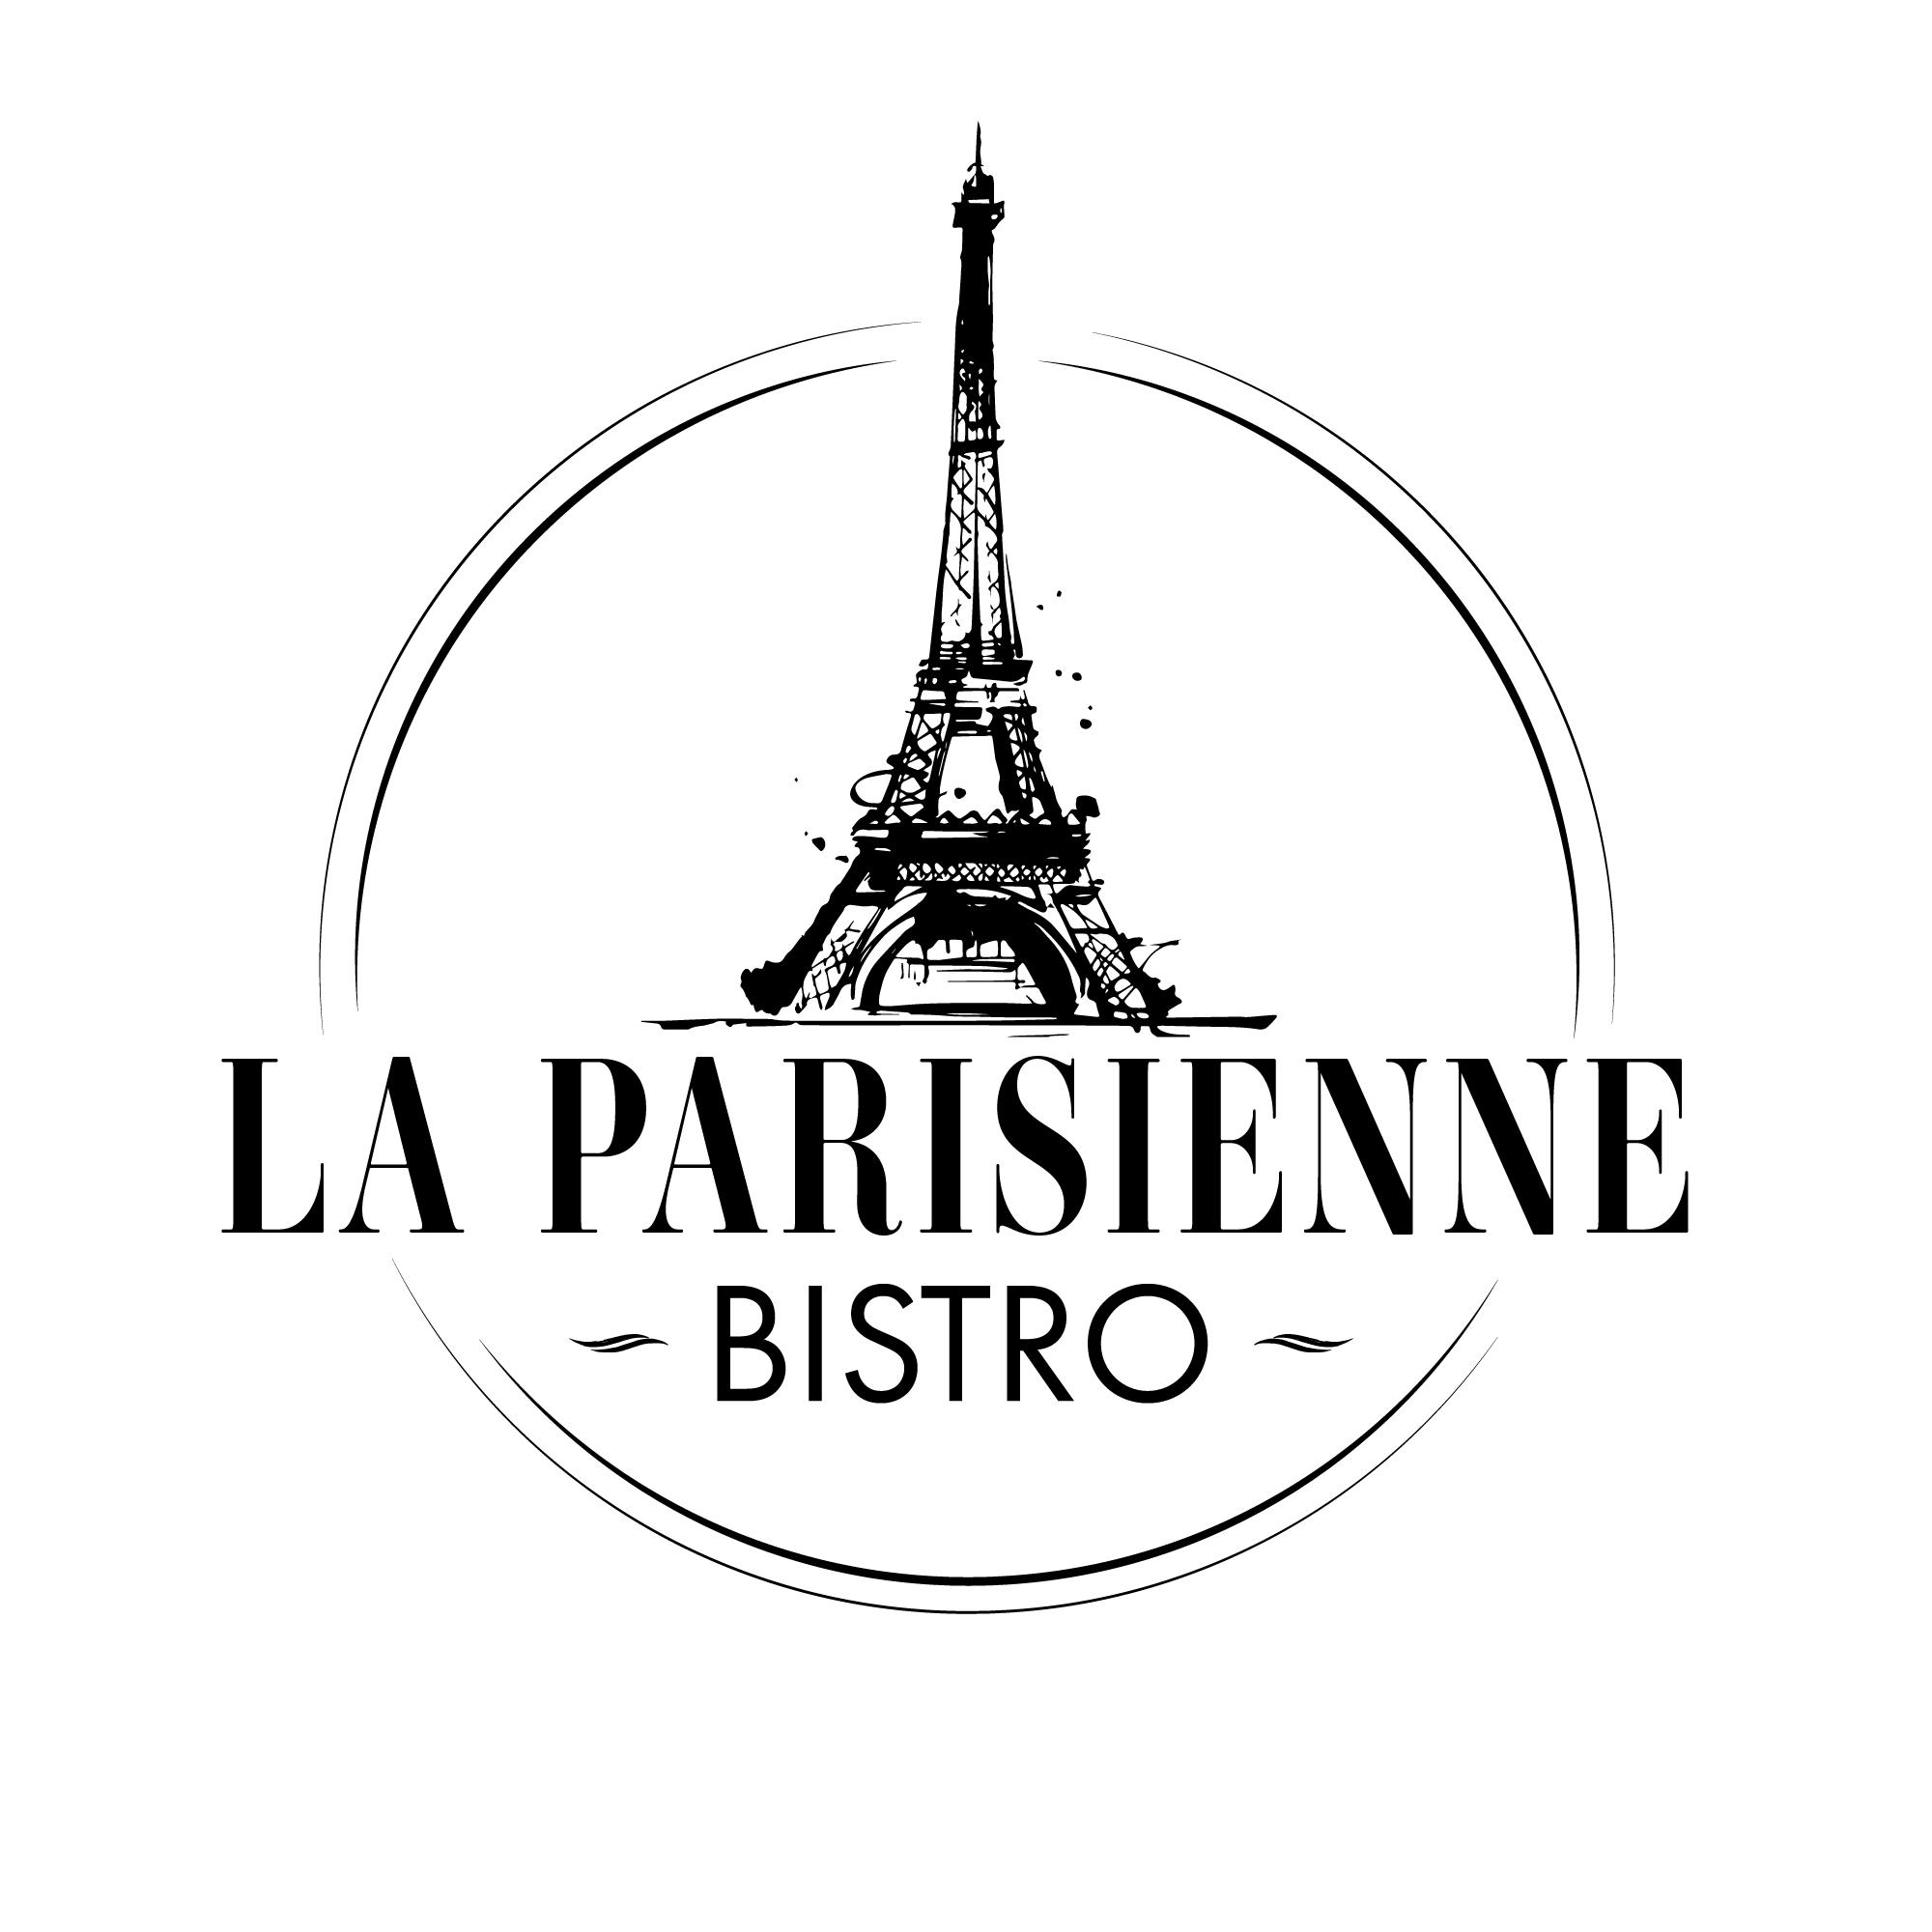 Logo La Parisienne - Eiffelturm abstrakt